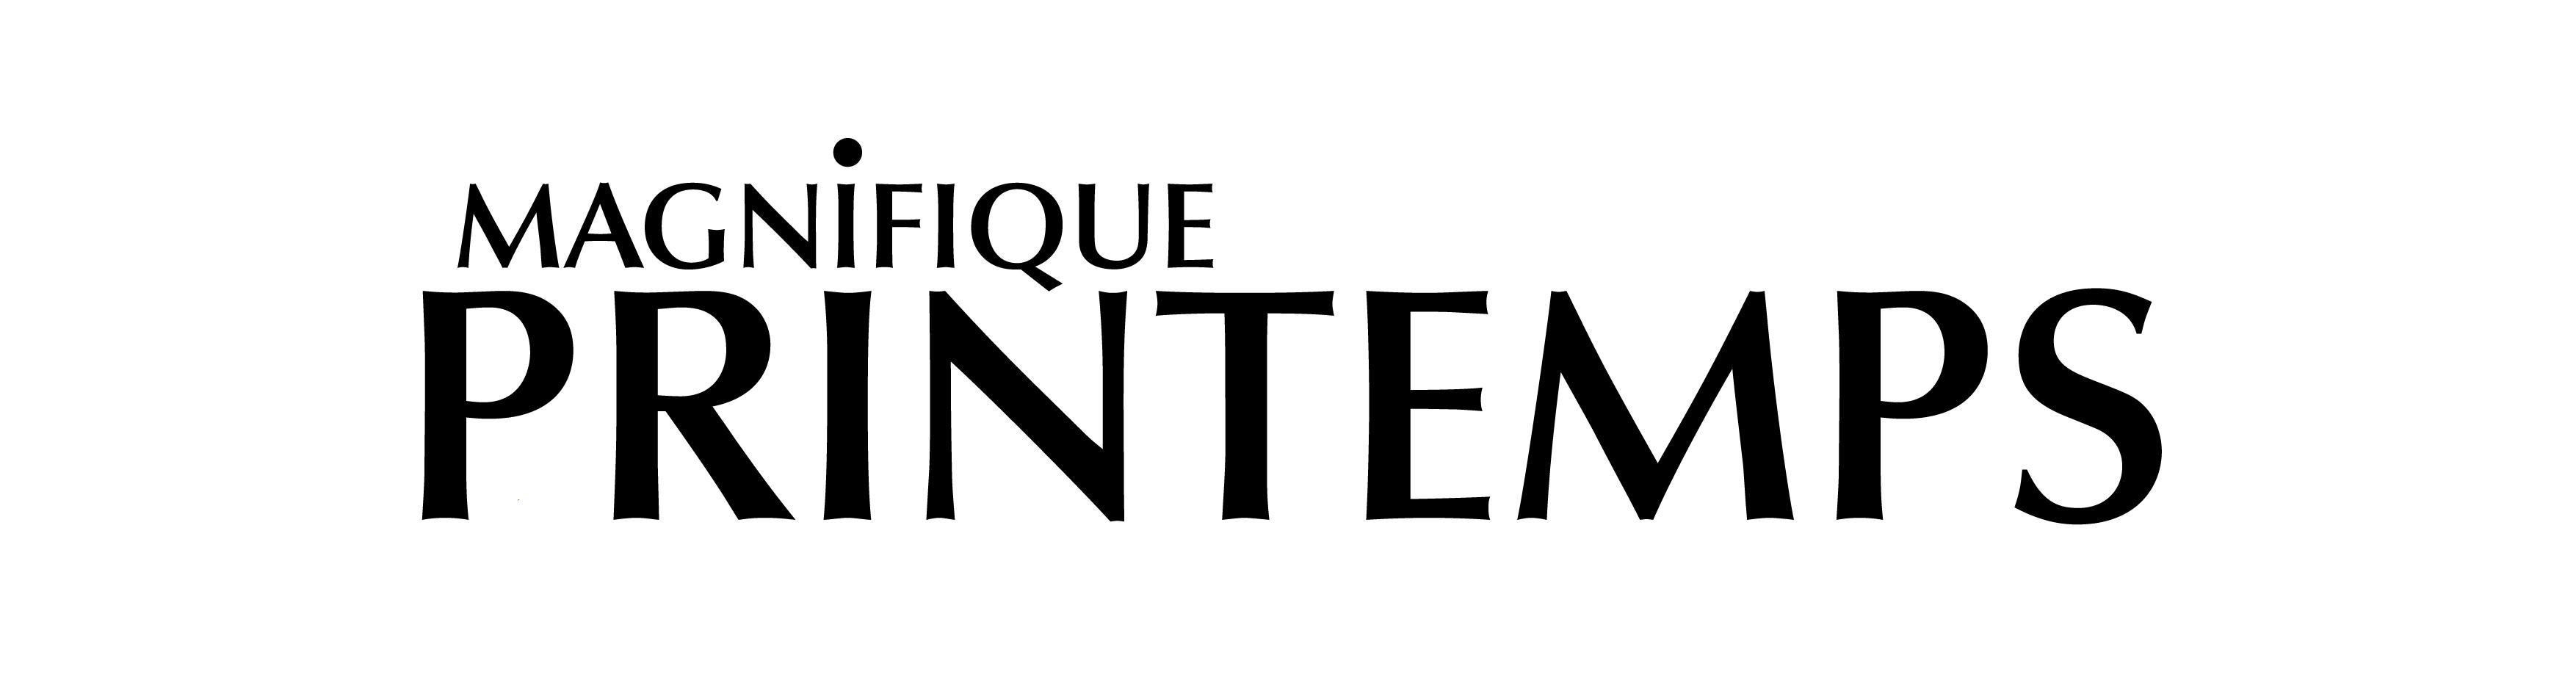 Logo Magnifique Printemps